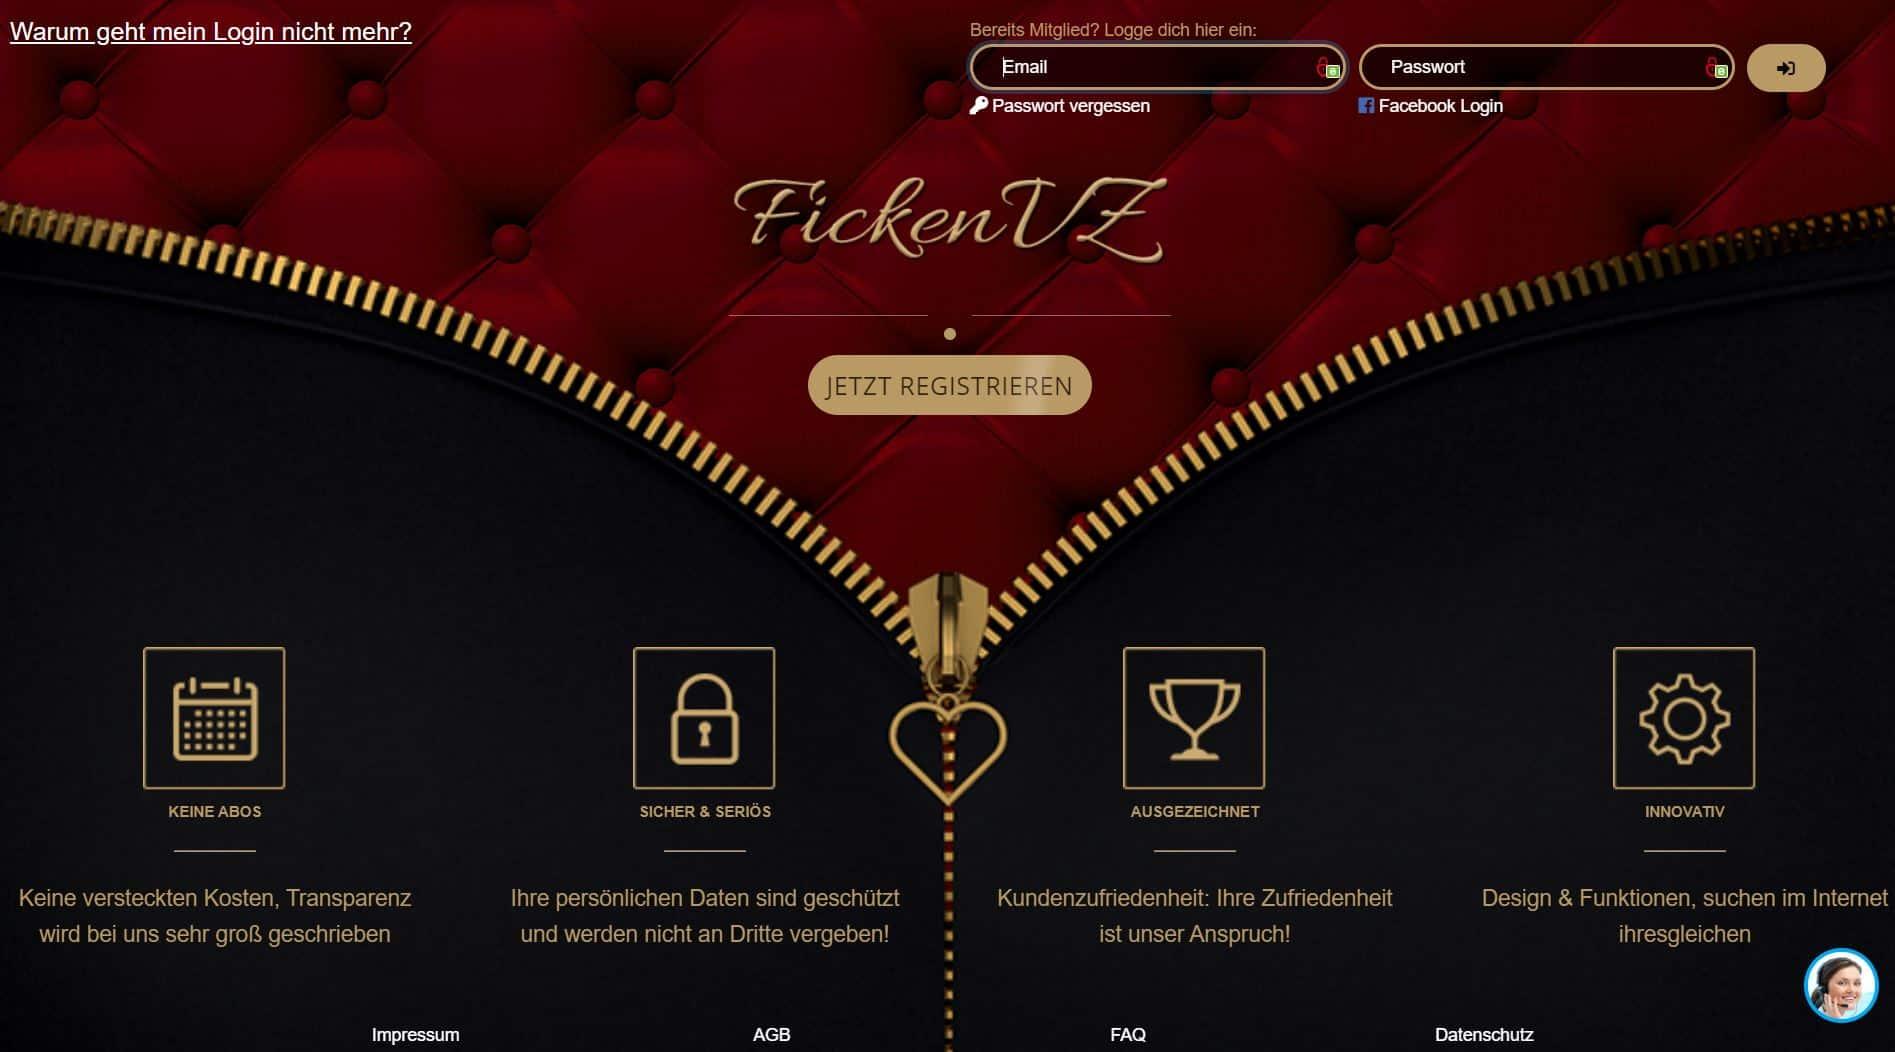 Testbericht: FickenVZ.net Abzocke